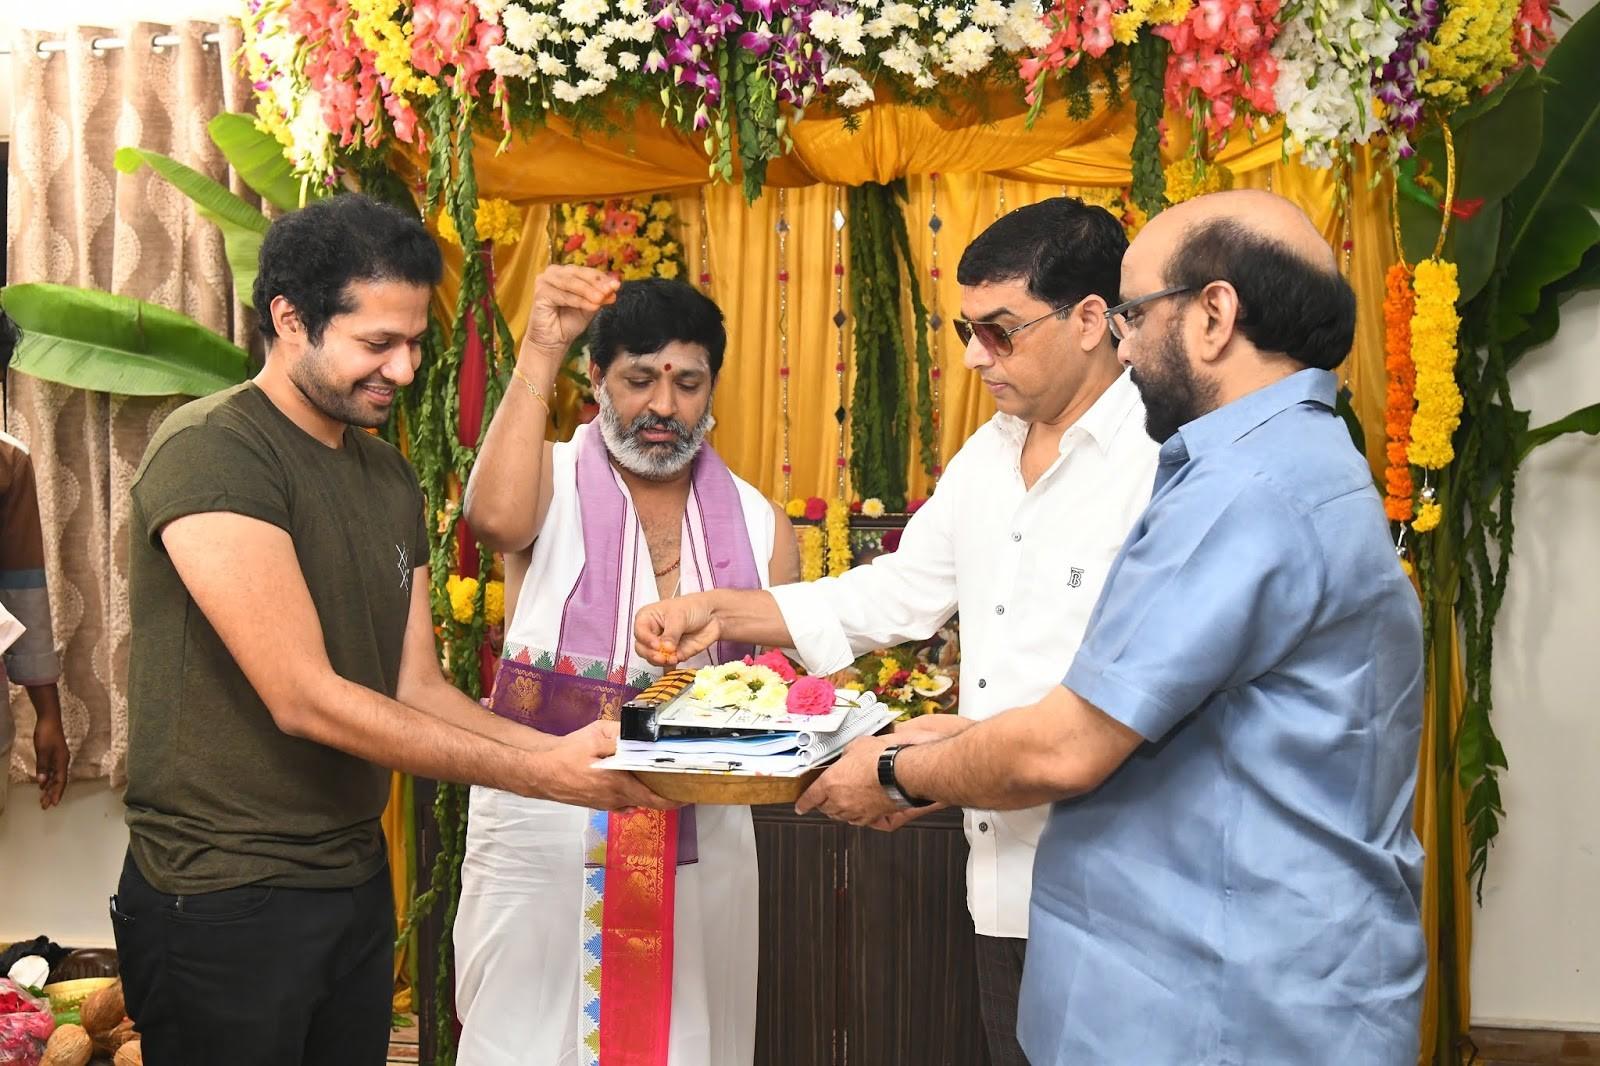 Dil Raju, S Radhakrishna @ Nithin Keerthy Suresh Rang De Movie Pooja